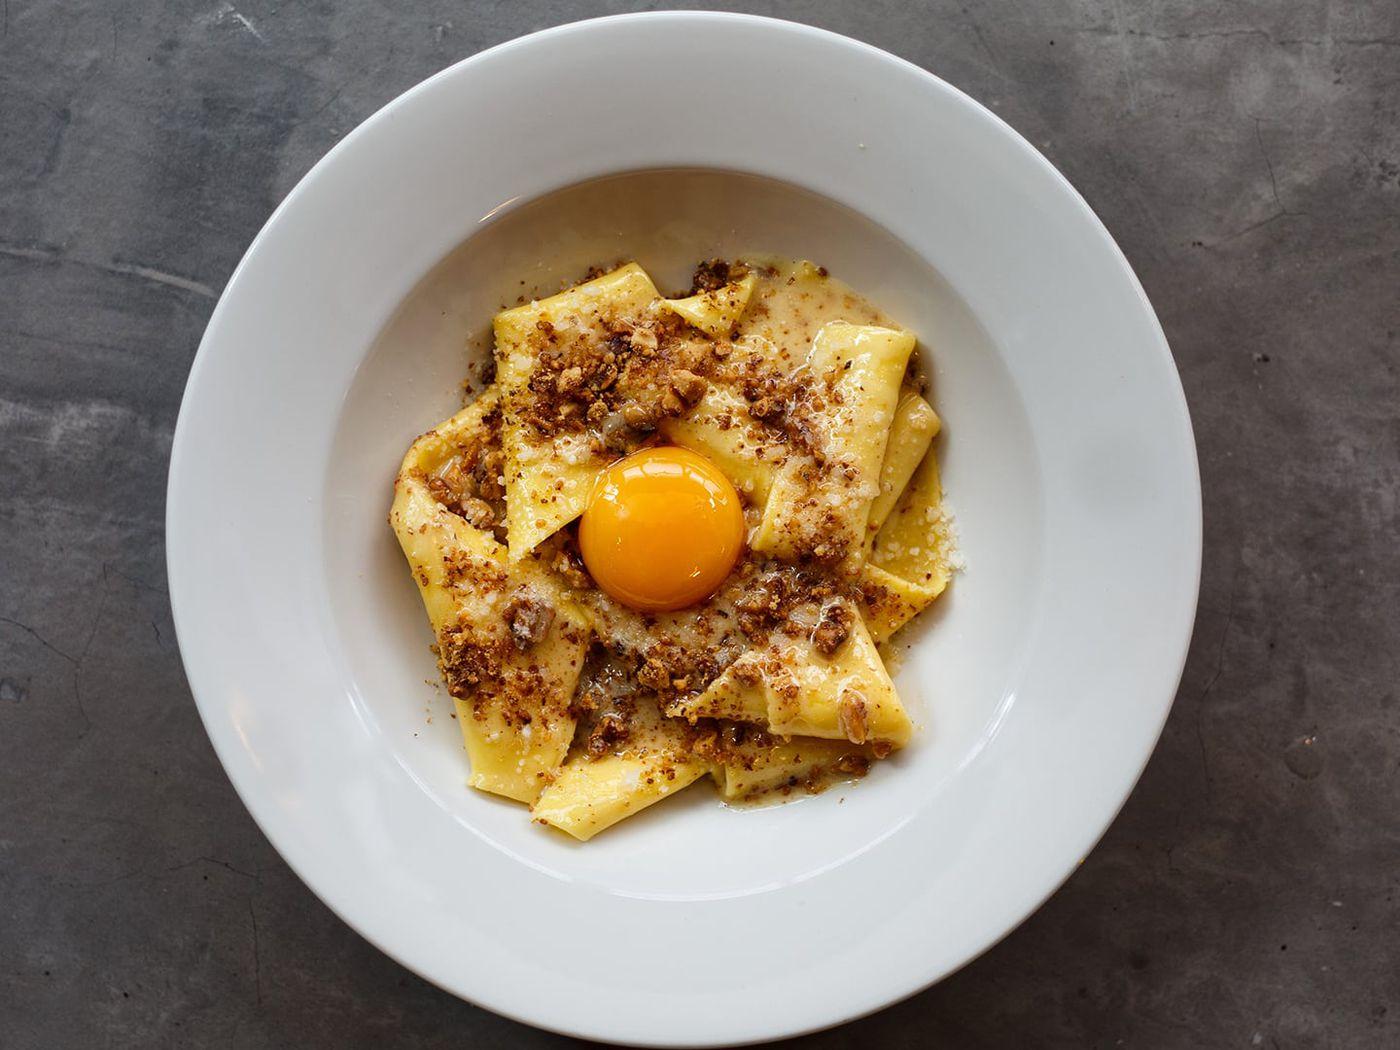 Bancone Covent Garden Is Opening New Fresh Pasta Restaurant In Soho Eater London